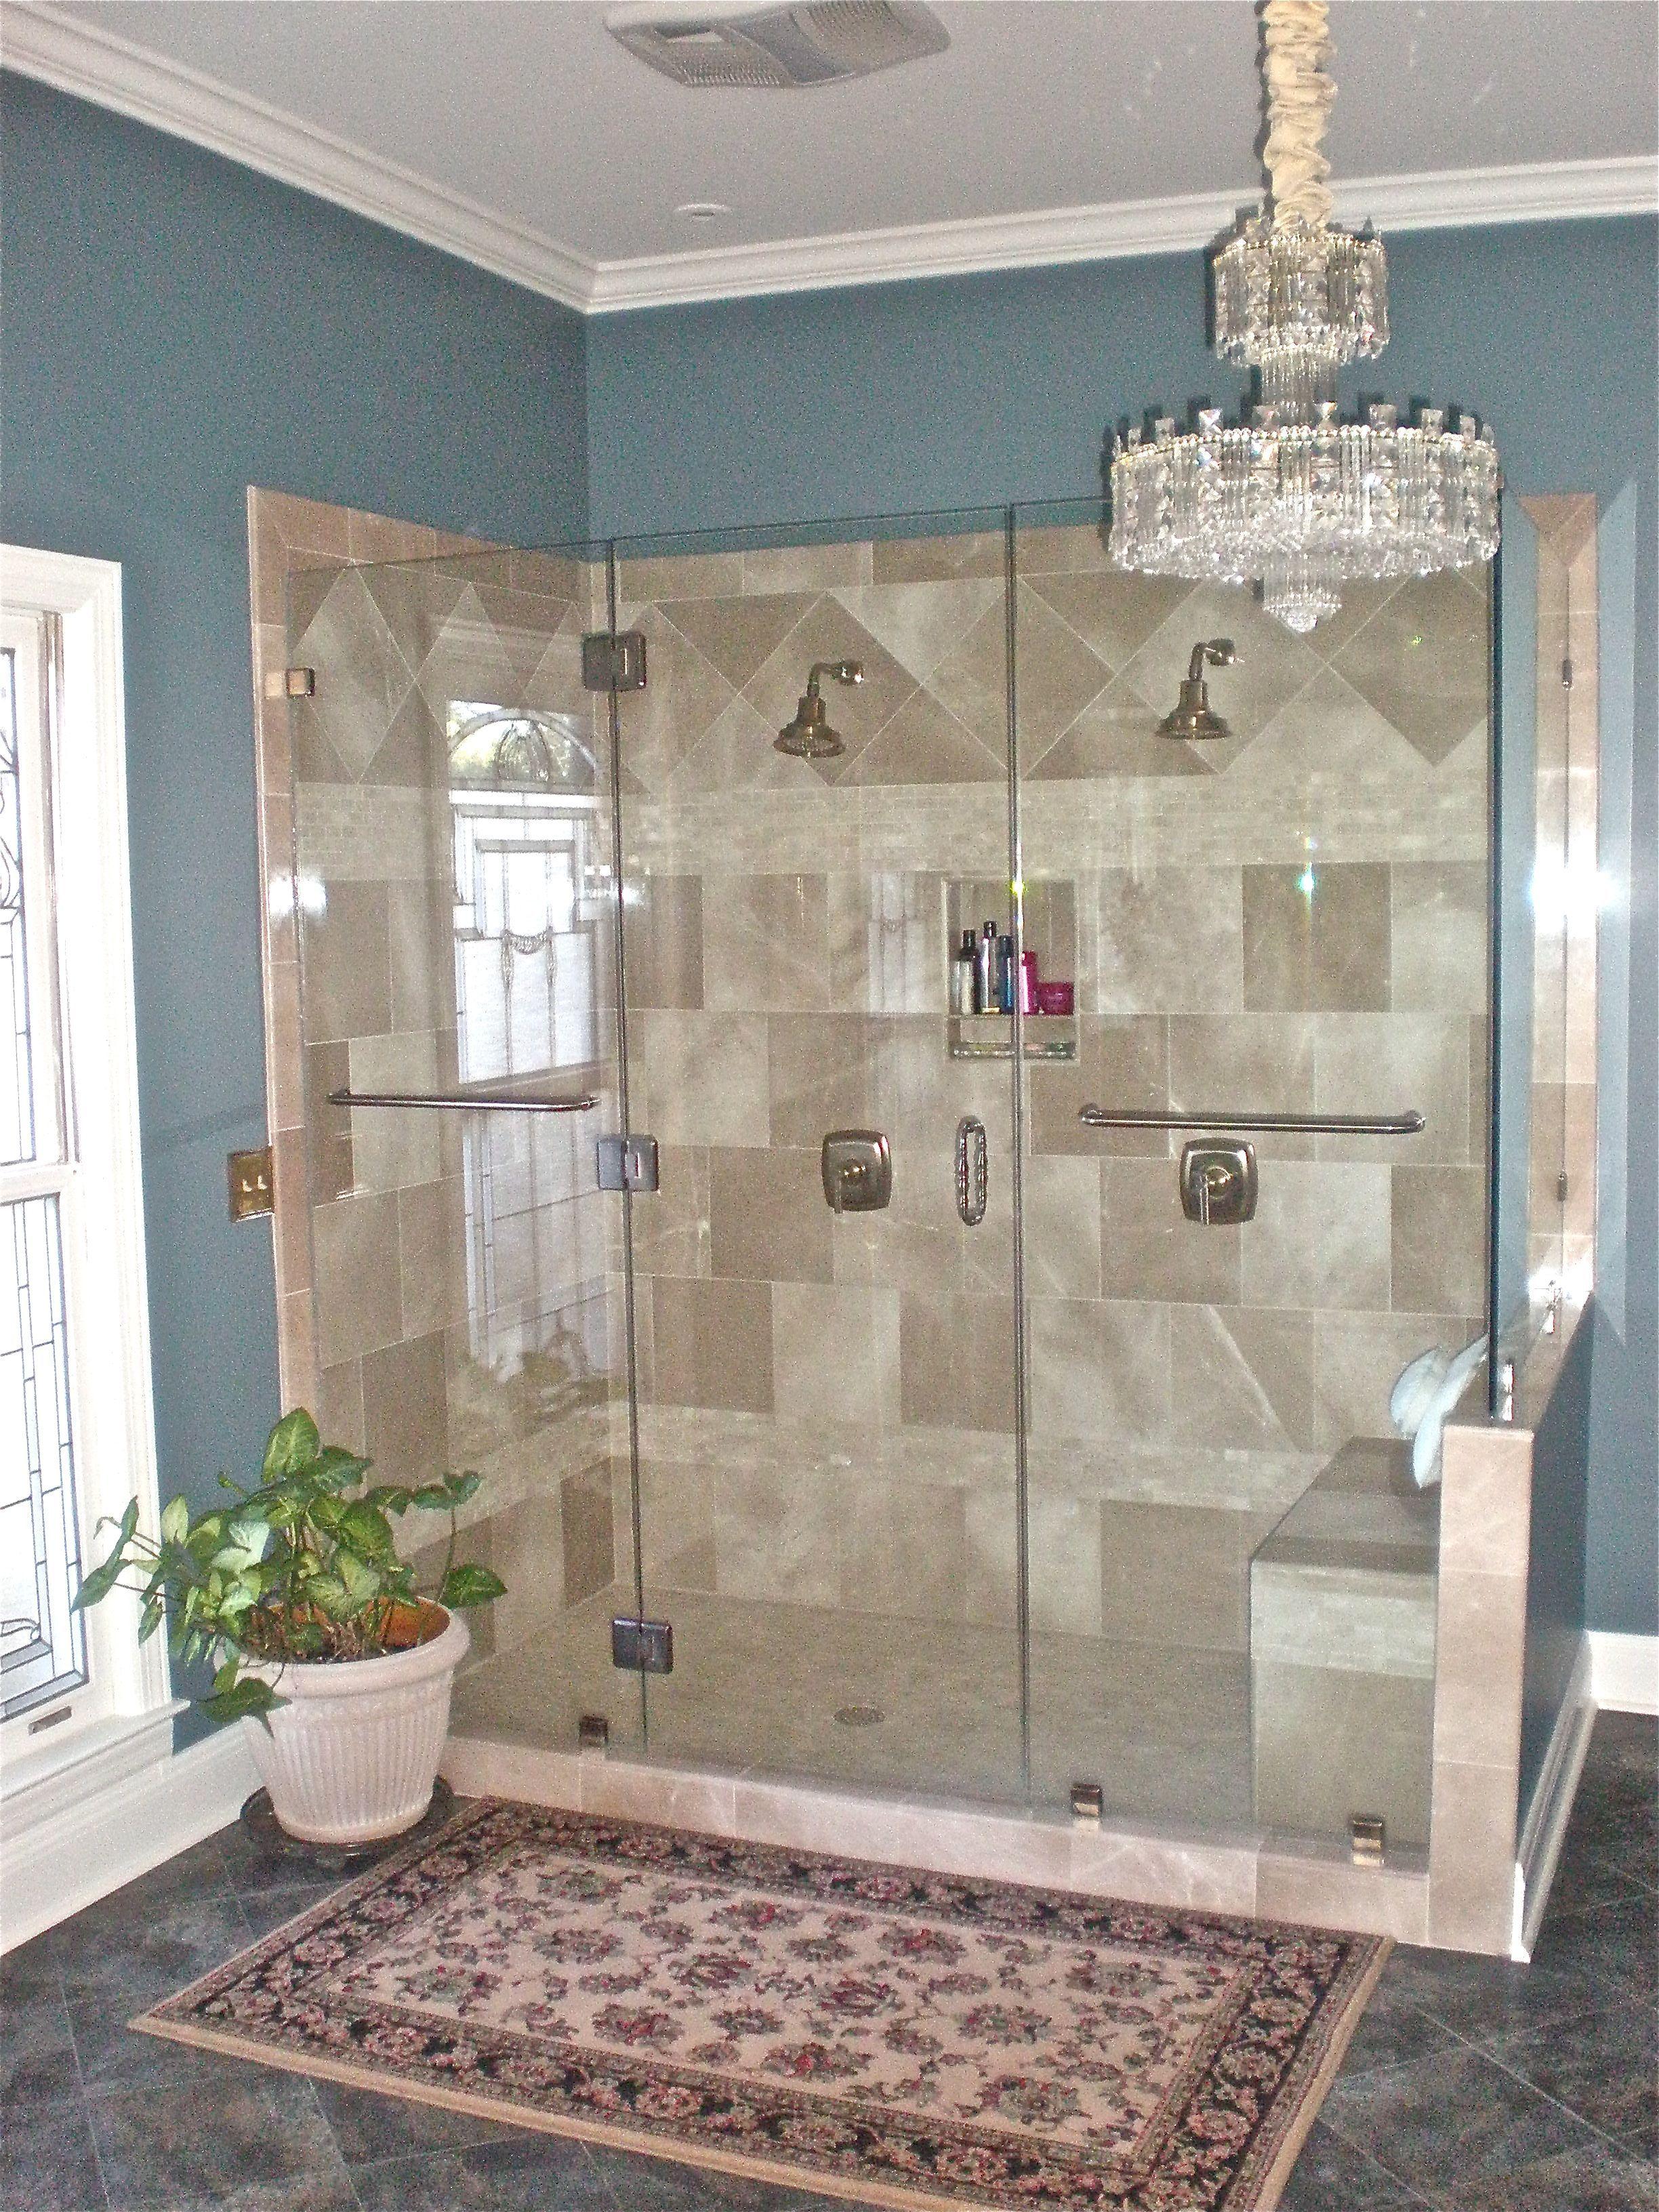 Custom Bathroom Shower Design By Annah Hill Of Nonn S Design Showplace Custom Bathroom Bathroom Shower Design Bathroom